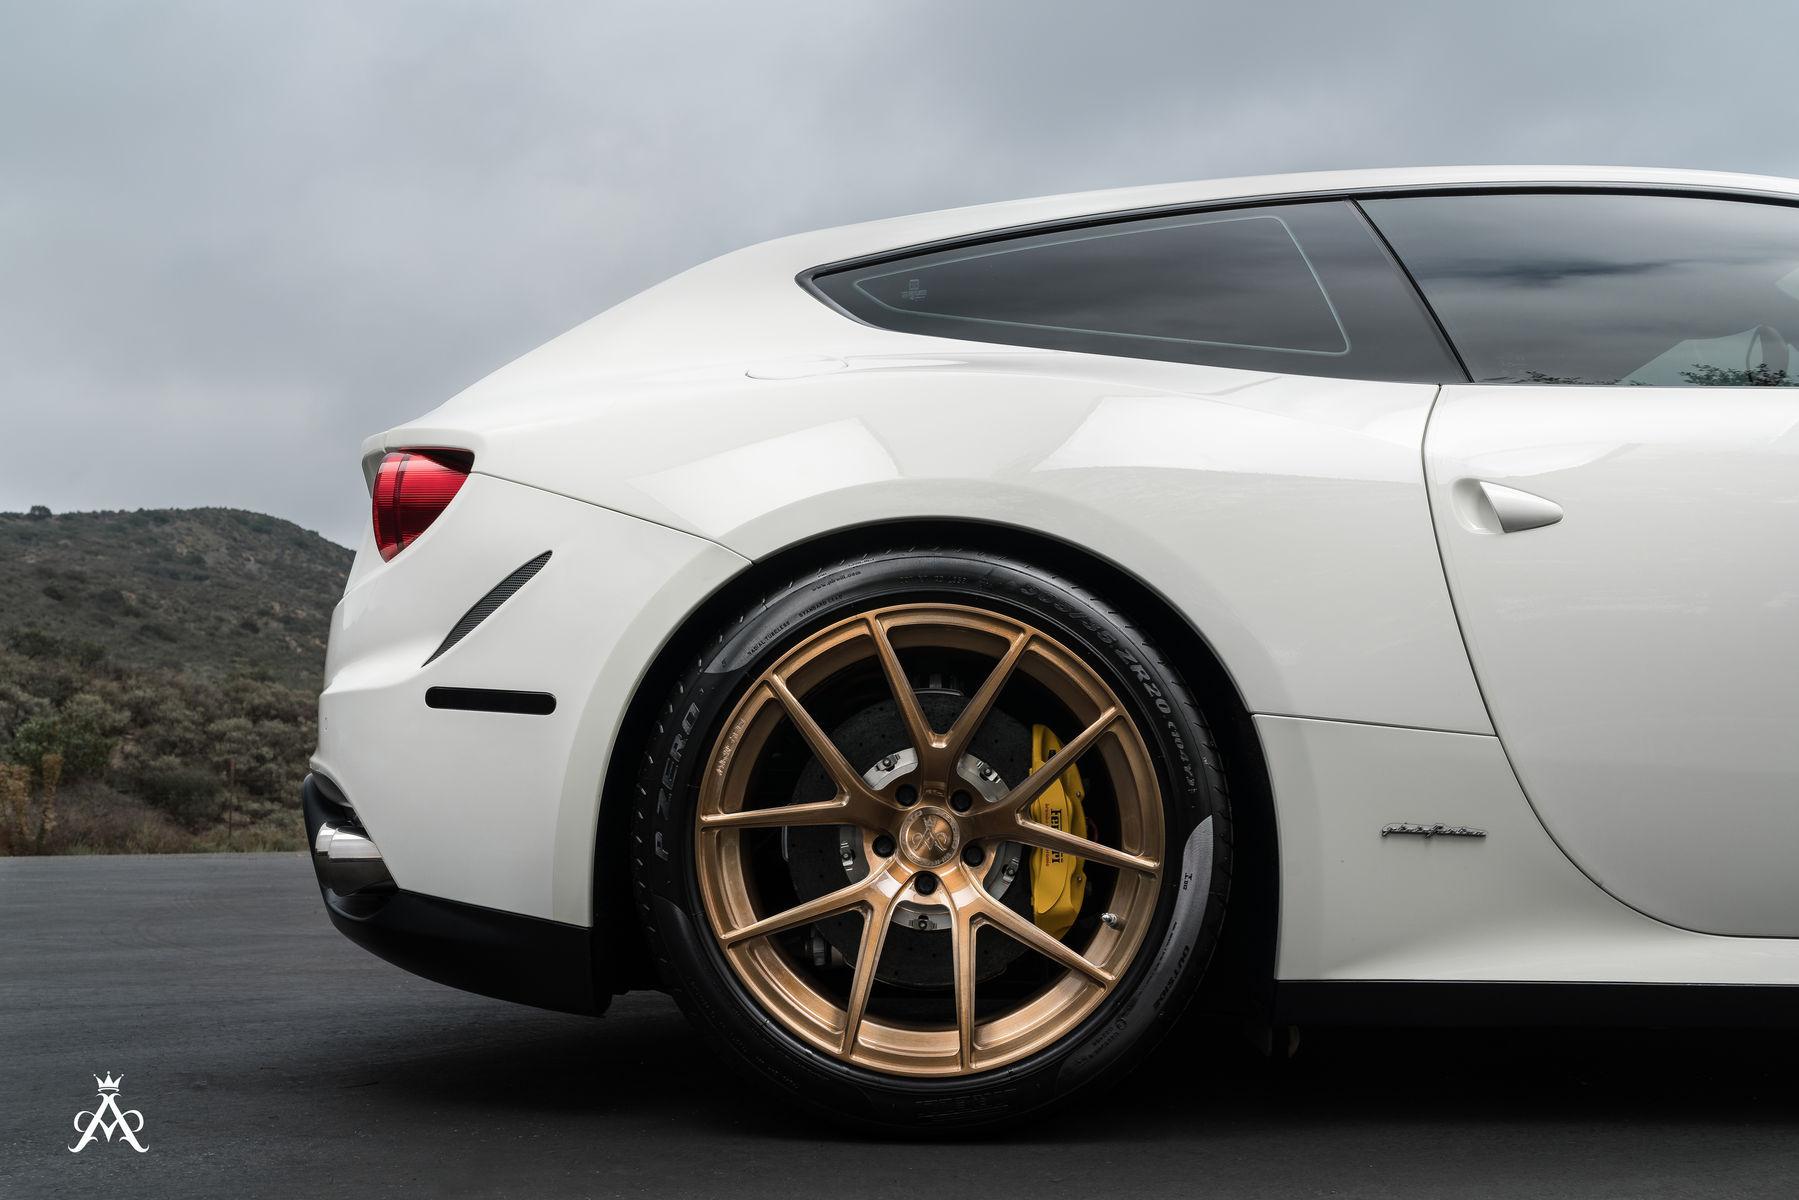 Ferrari FF | Ferrari FF & Mercedes GTS AMG Duo Shoot